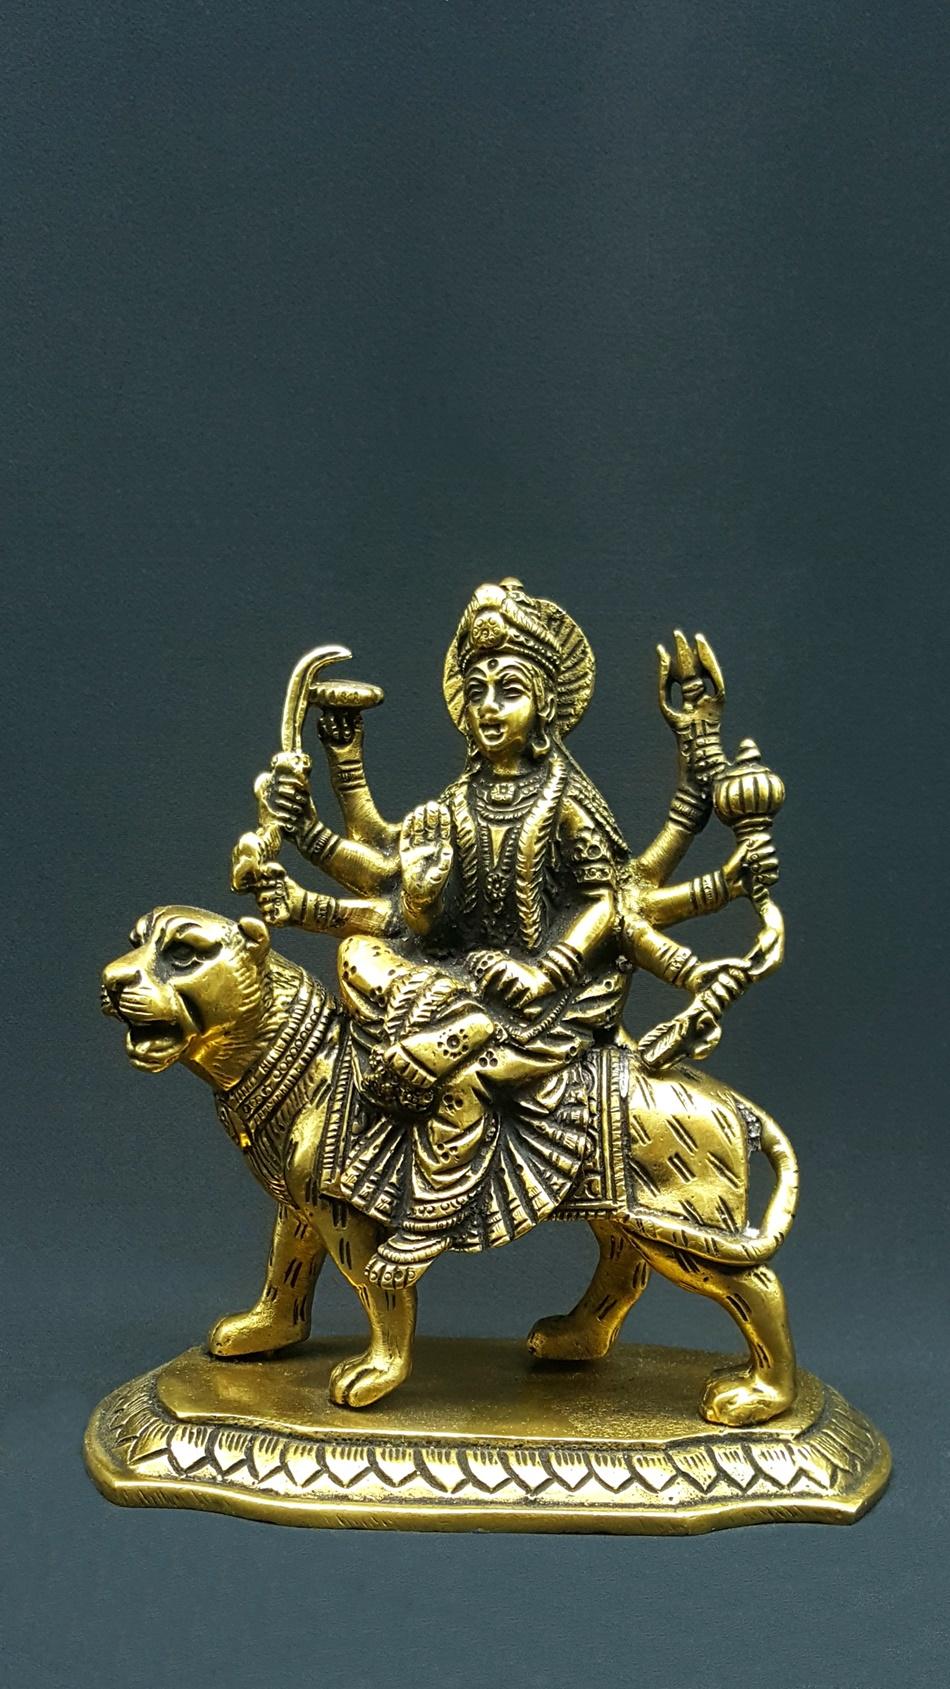 Purpledip Brass Ganesha Small Statue in Reclining//Sleeping Posture Unique Avatar of Hindu Elephant God Indian D/Ã/©cor Religious Gift 11041